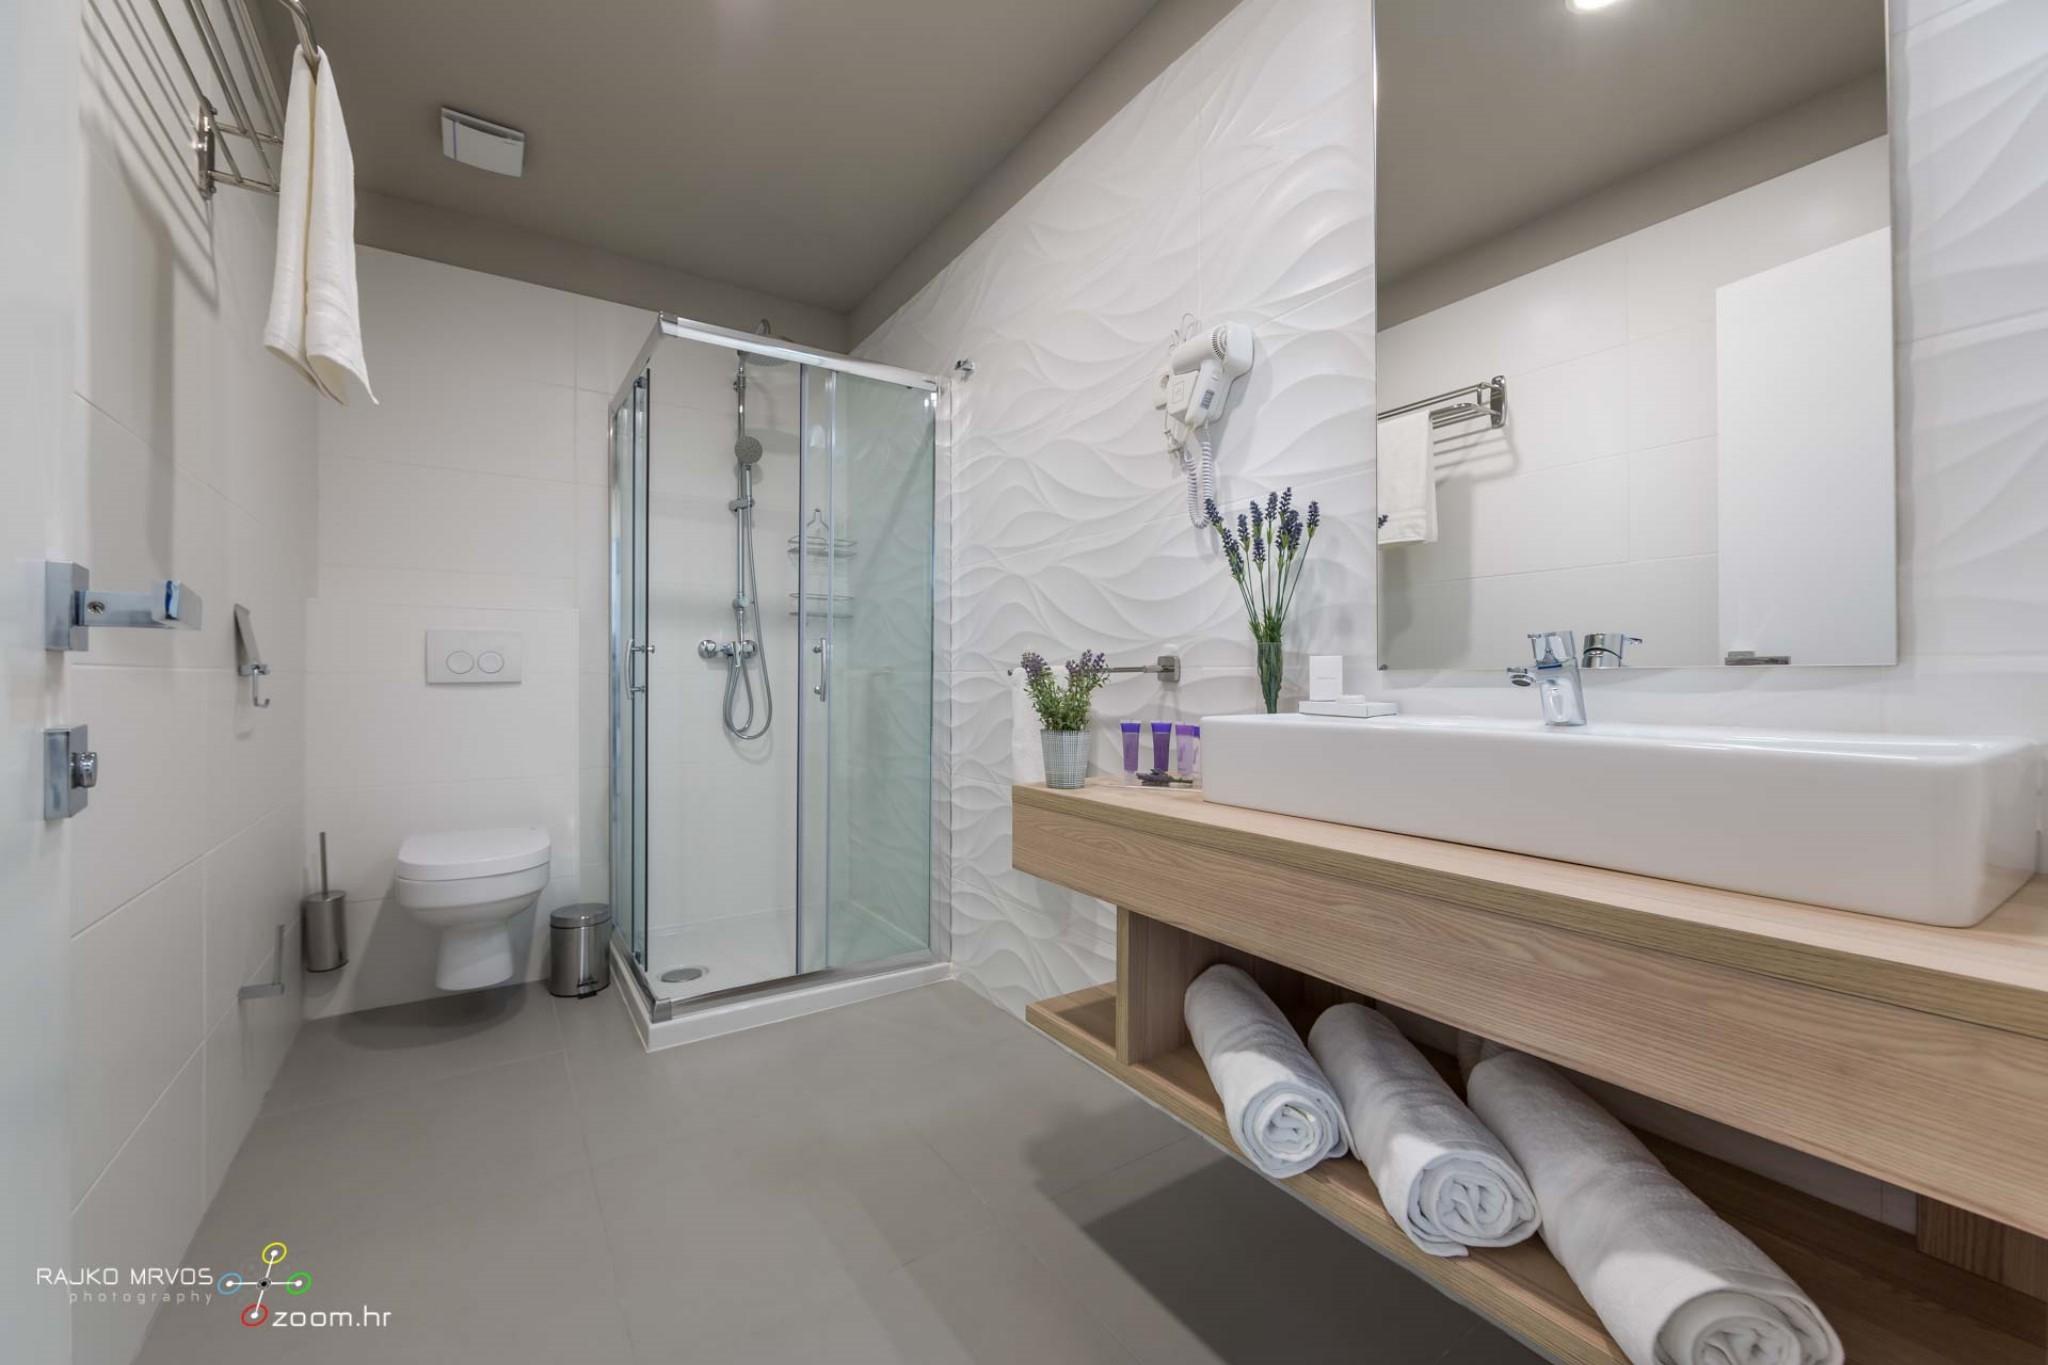 fotografiranje-interijera-fotograf-eksterijera-apartmana-vila-kuca-apartman-Preelook-24